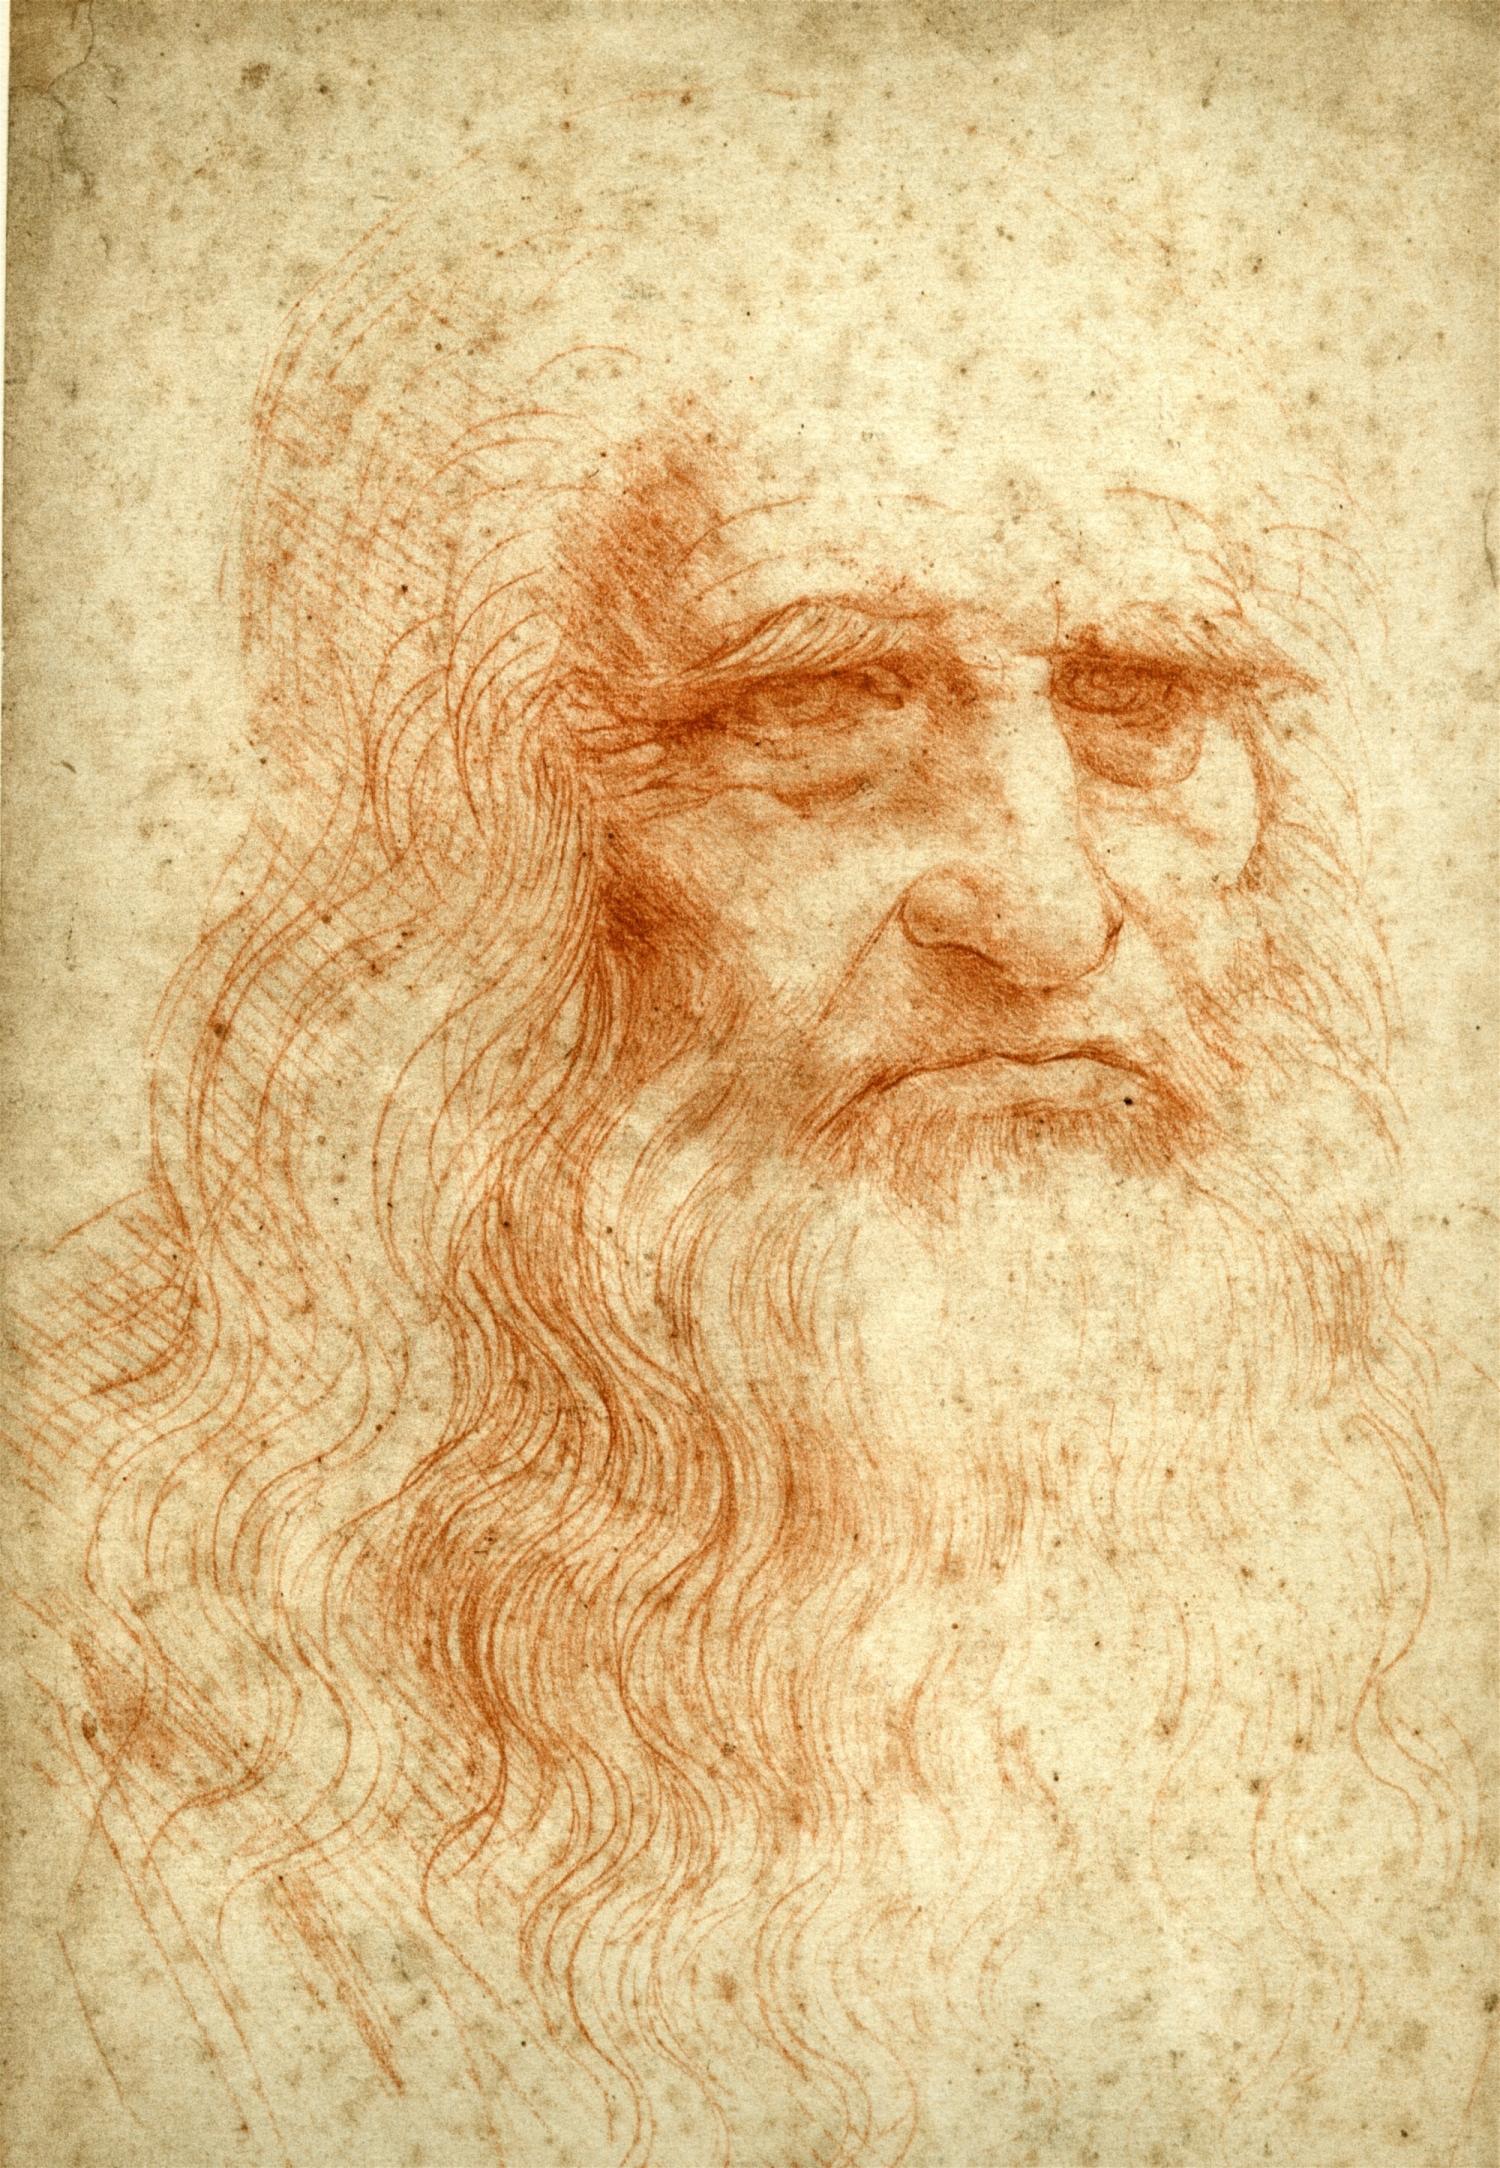 Self portrait of Leonardo da Vinci.